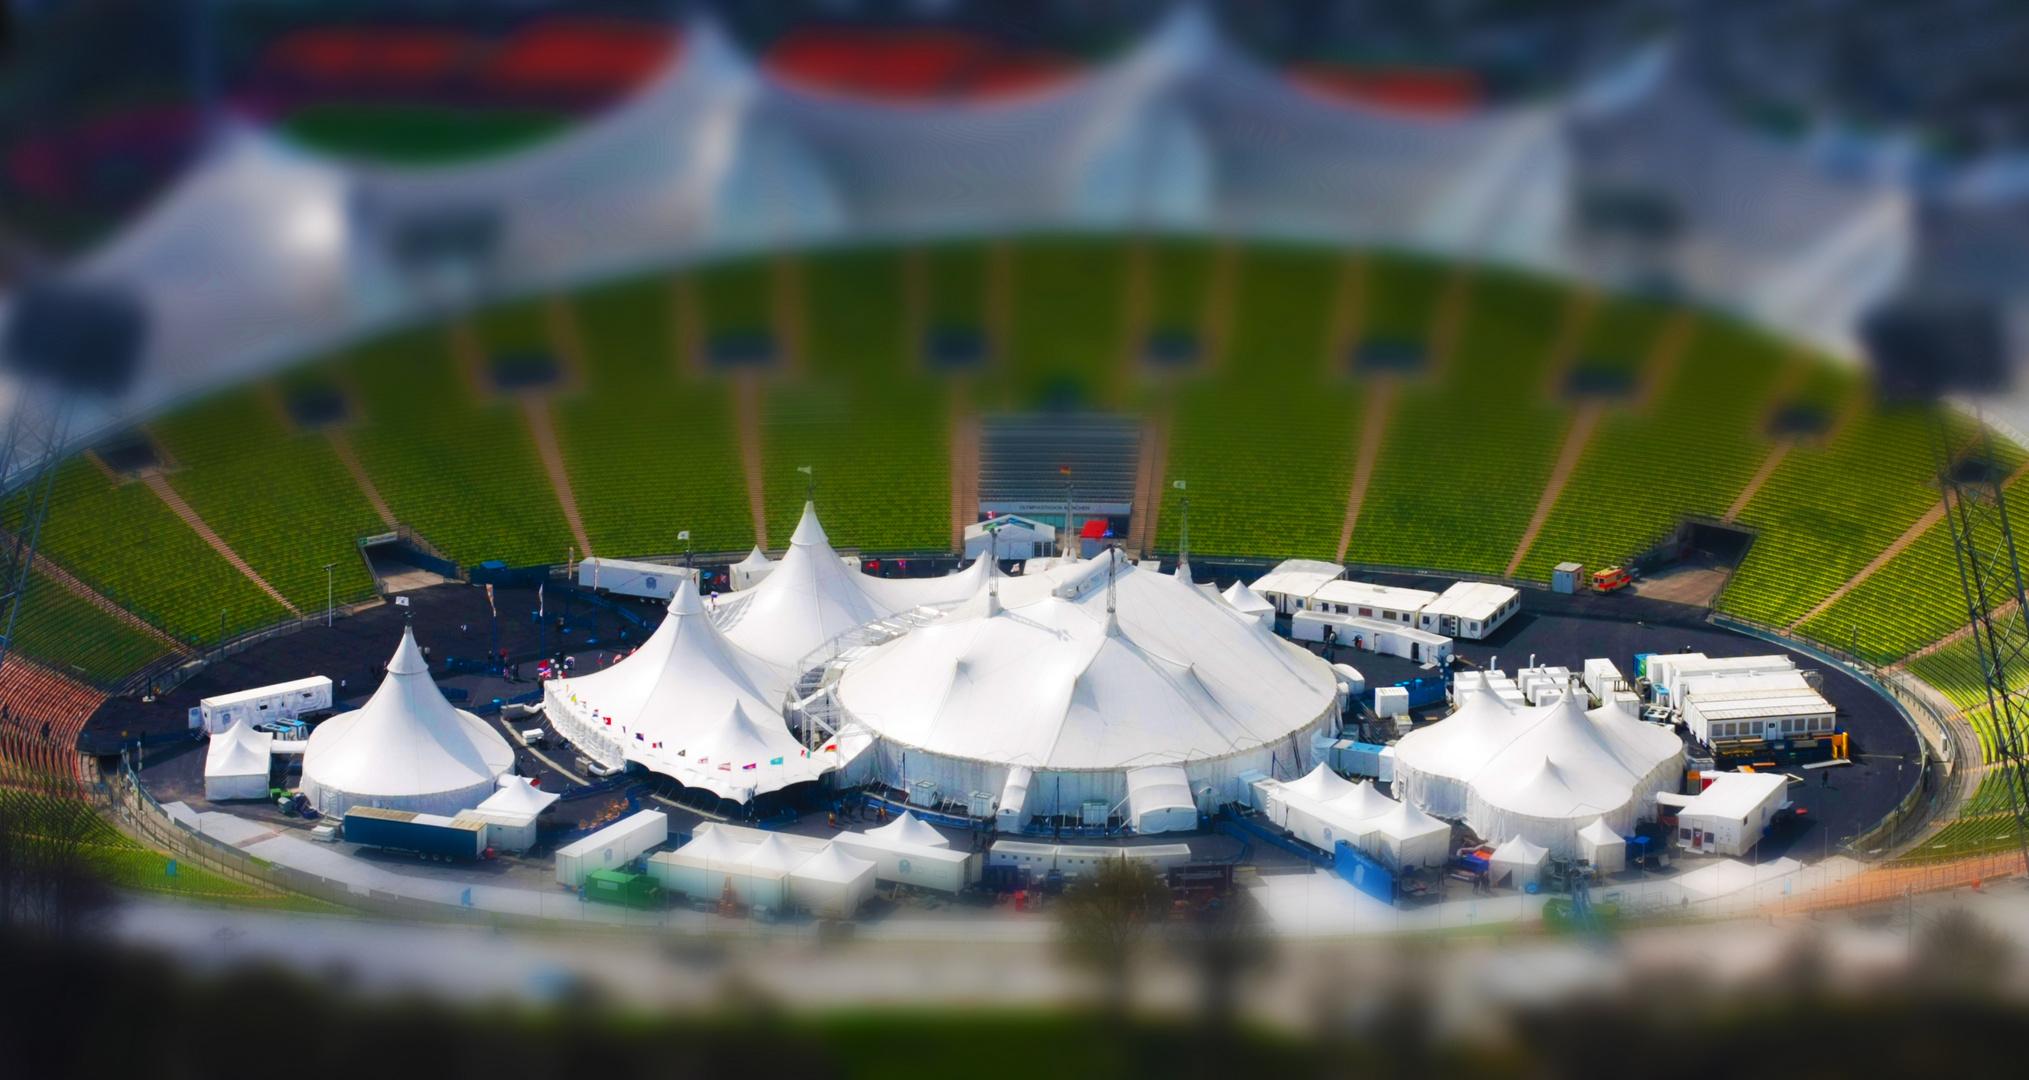 zirkus im olympiastadion tilt shift fake